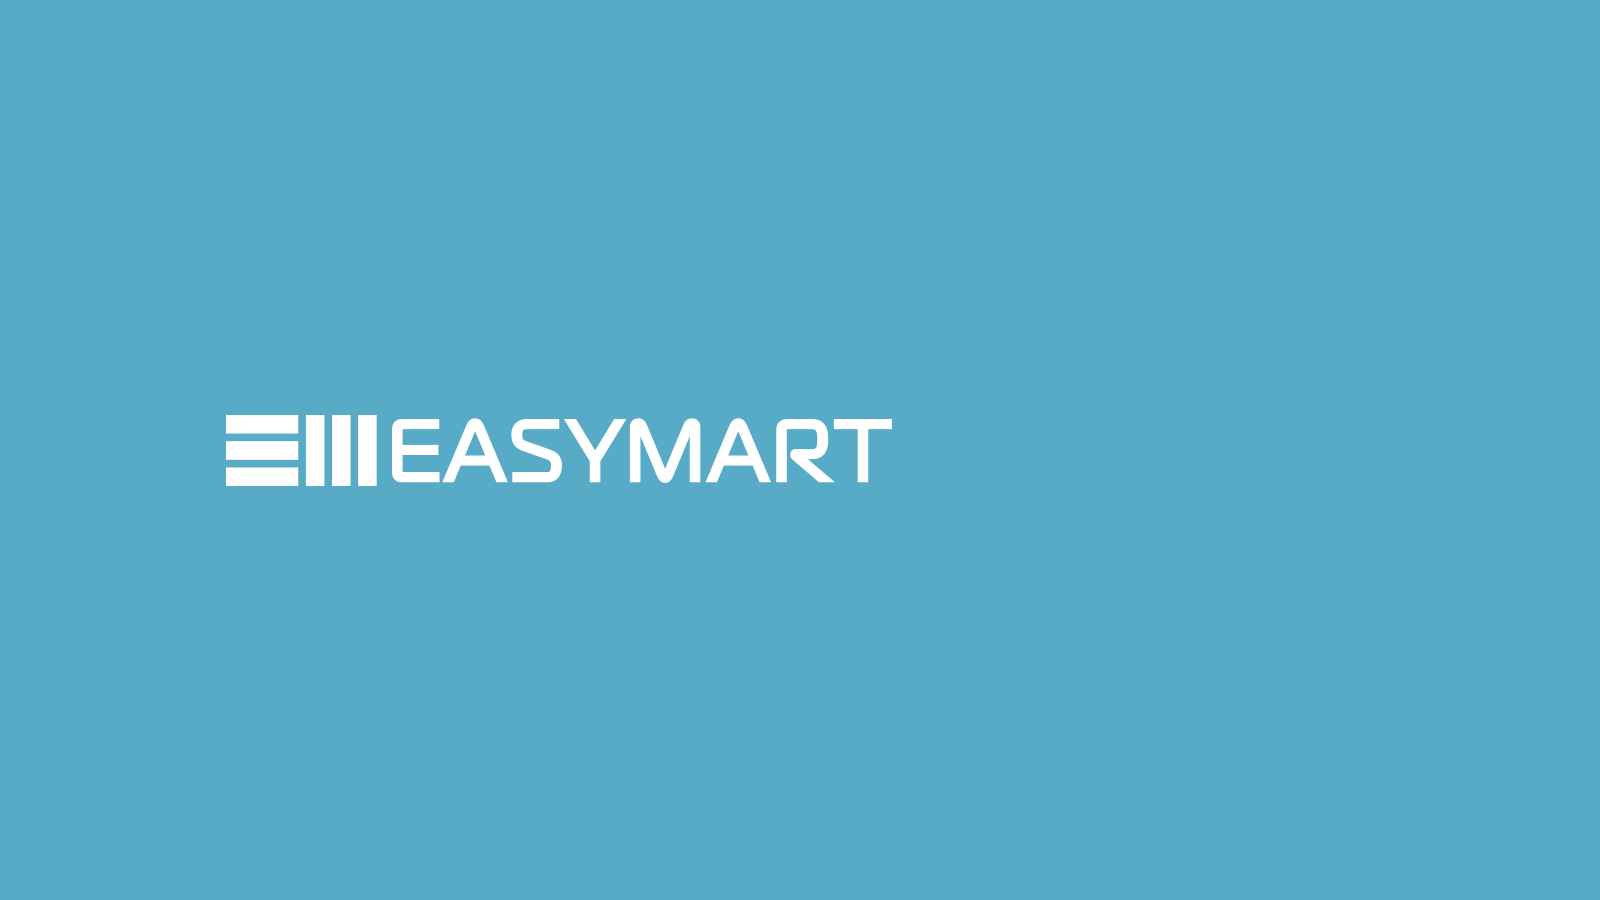 graphic-brand-design-web-designer-hiline-lahore-pakistan-easy-mart-banner